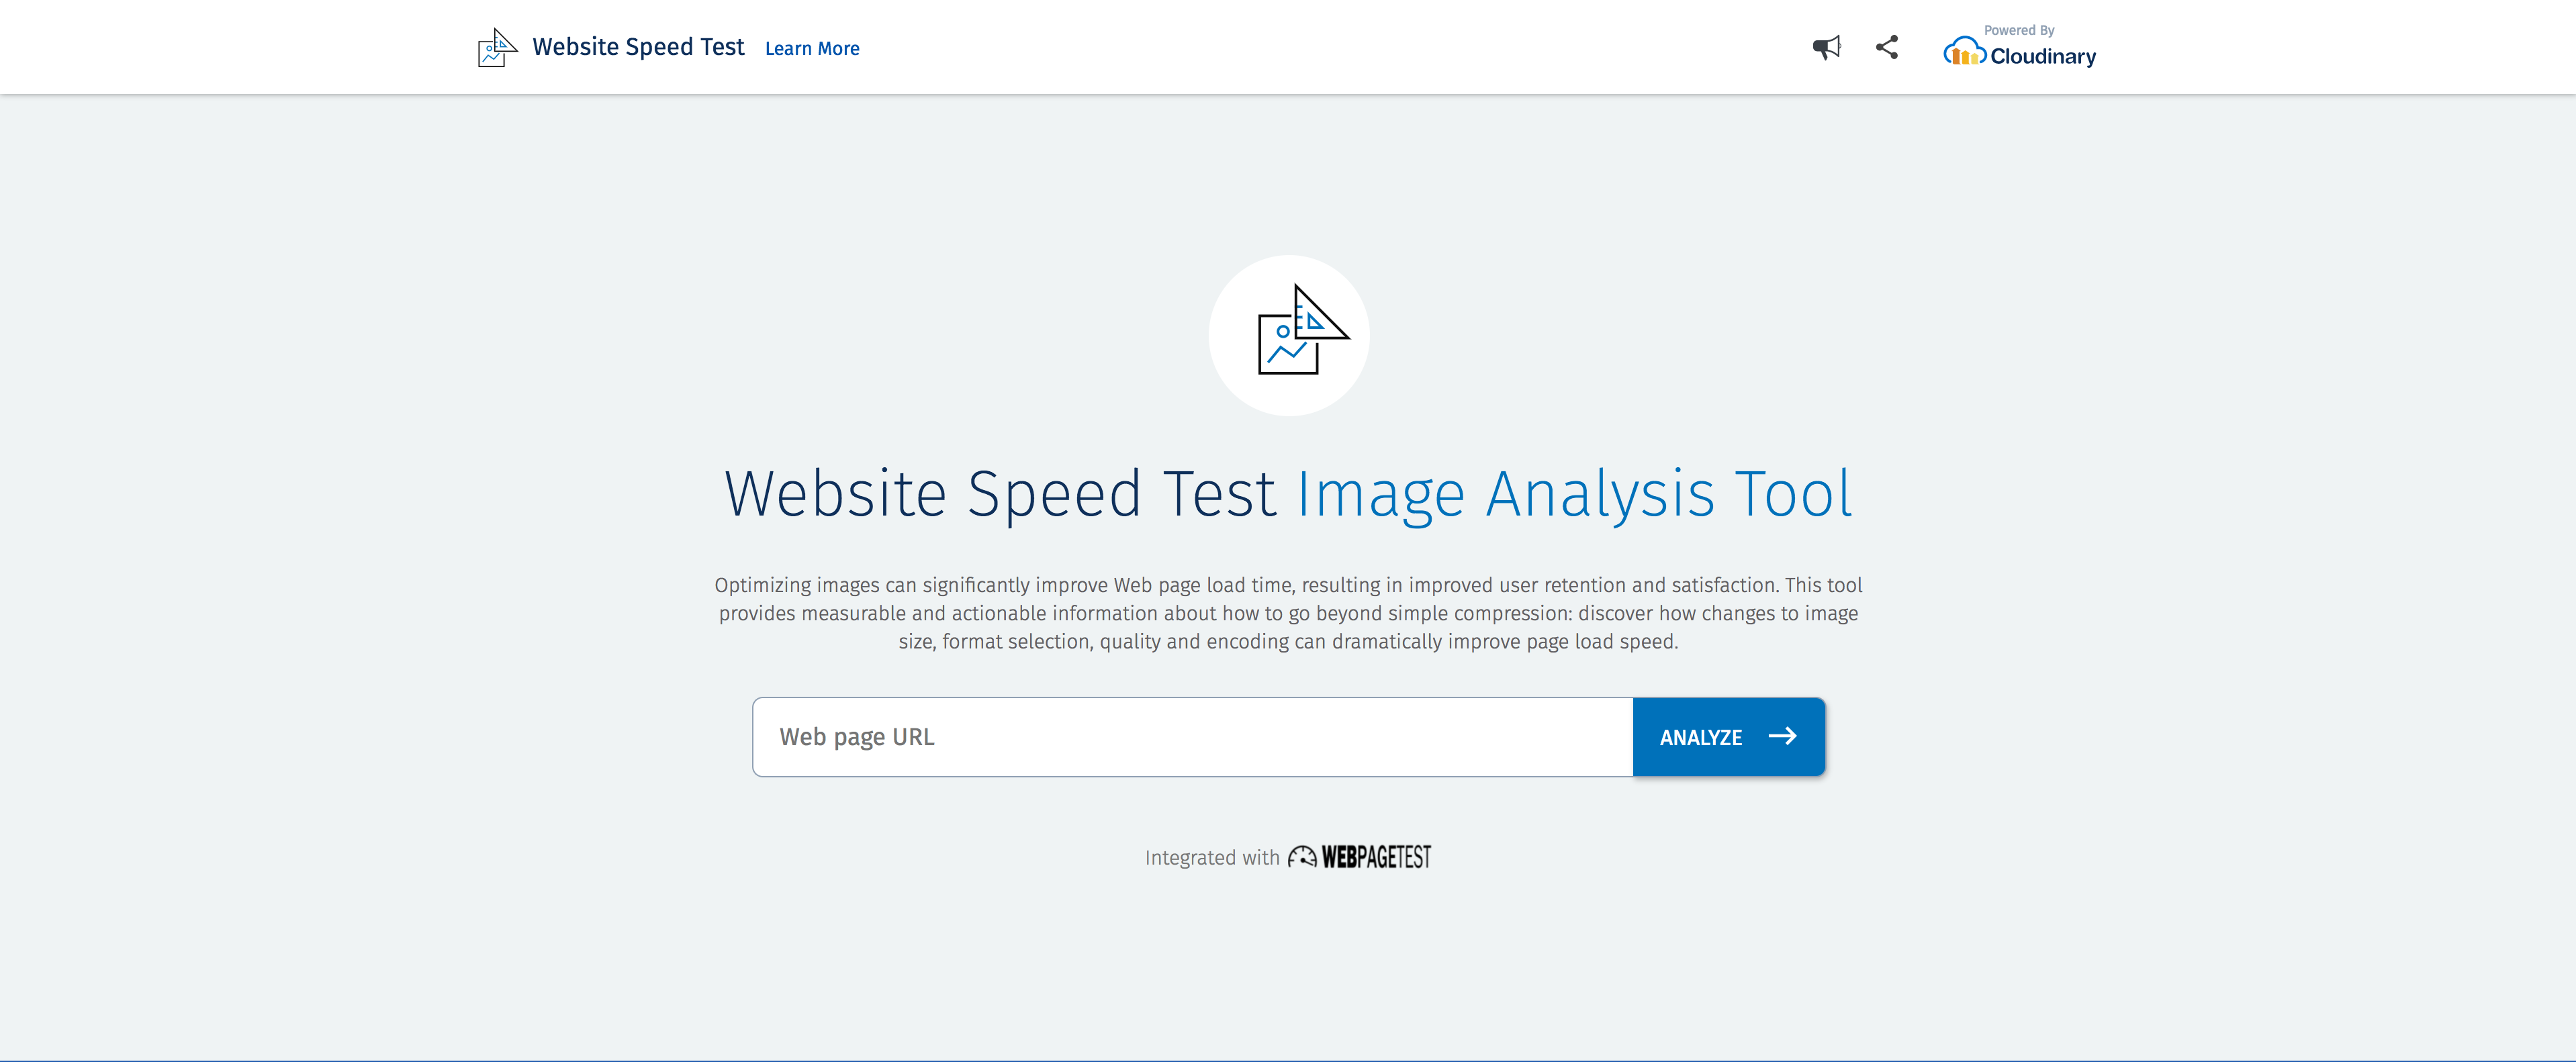 webspeedtest